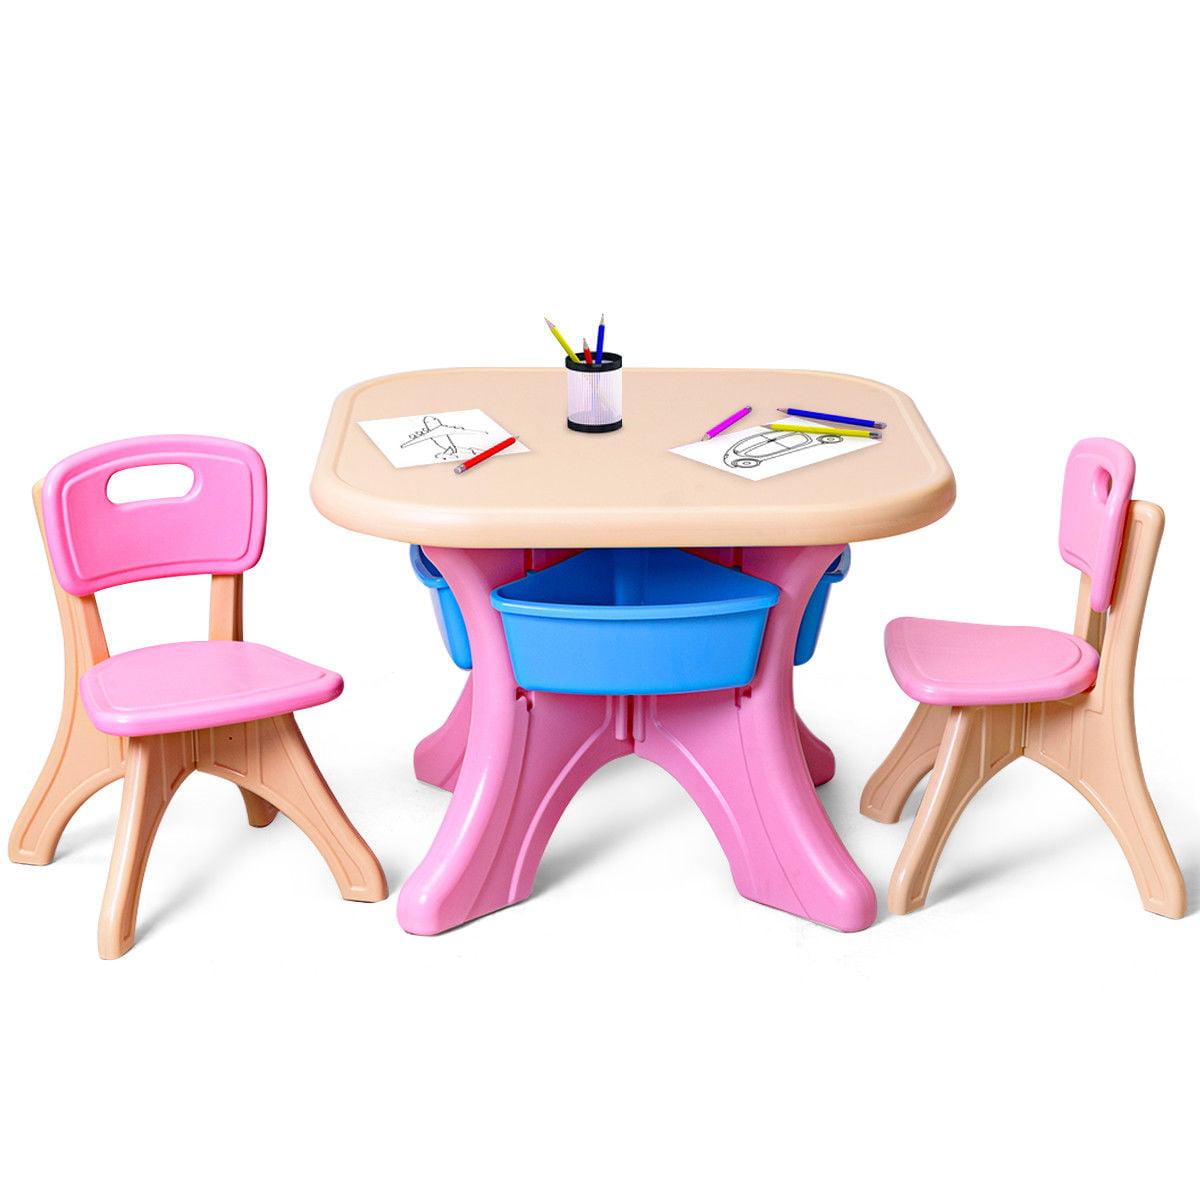 Pleasant Gymax Plastic Children Kids Table Chair Set 3 Pc Play Furniture Interior Design Ideas Gentotryabchikinfo